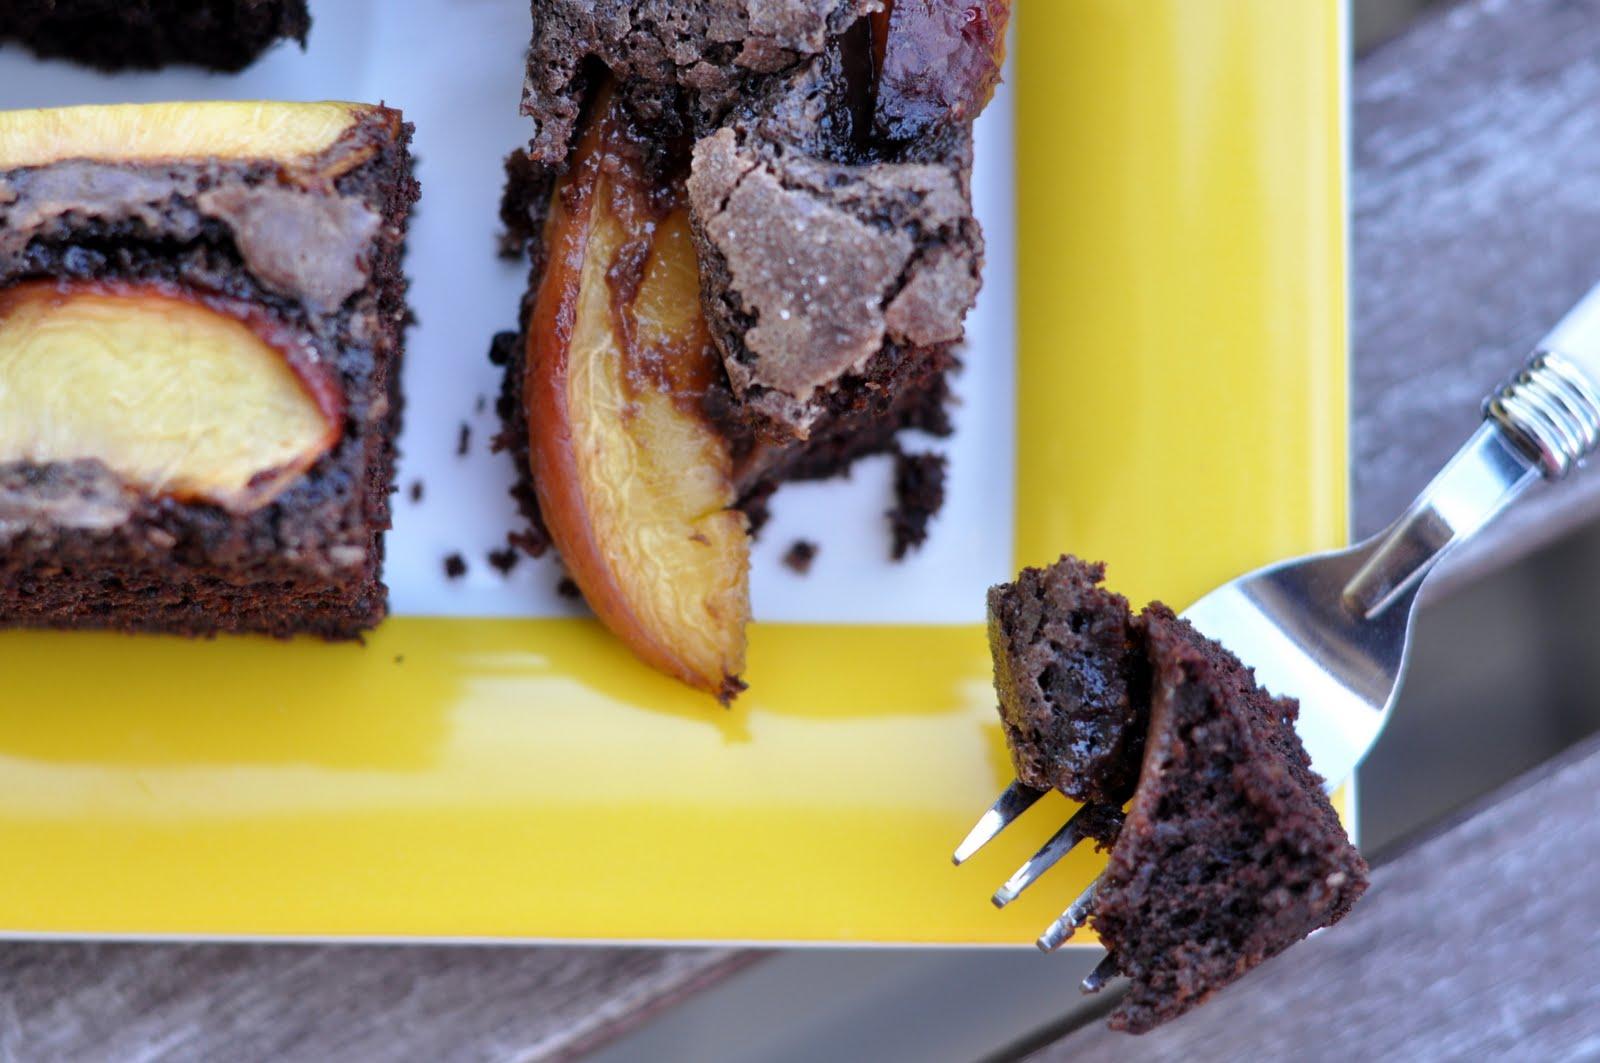 Agata S Kitchen The Most Strange Delicious Chocolate Cake